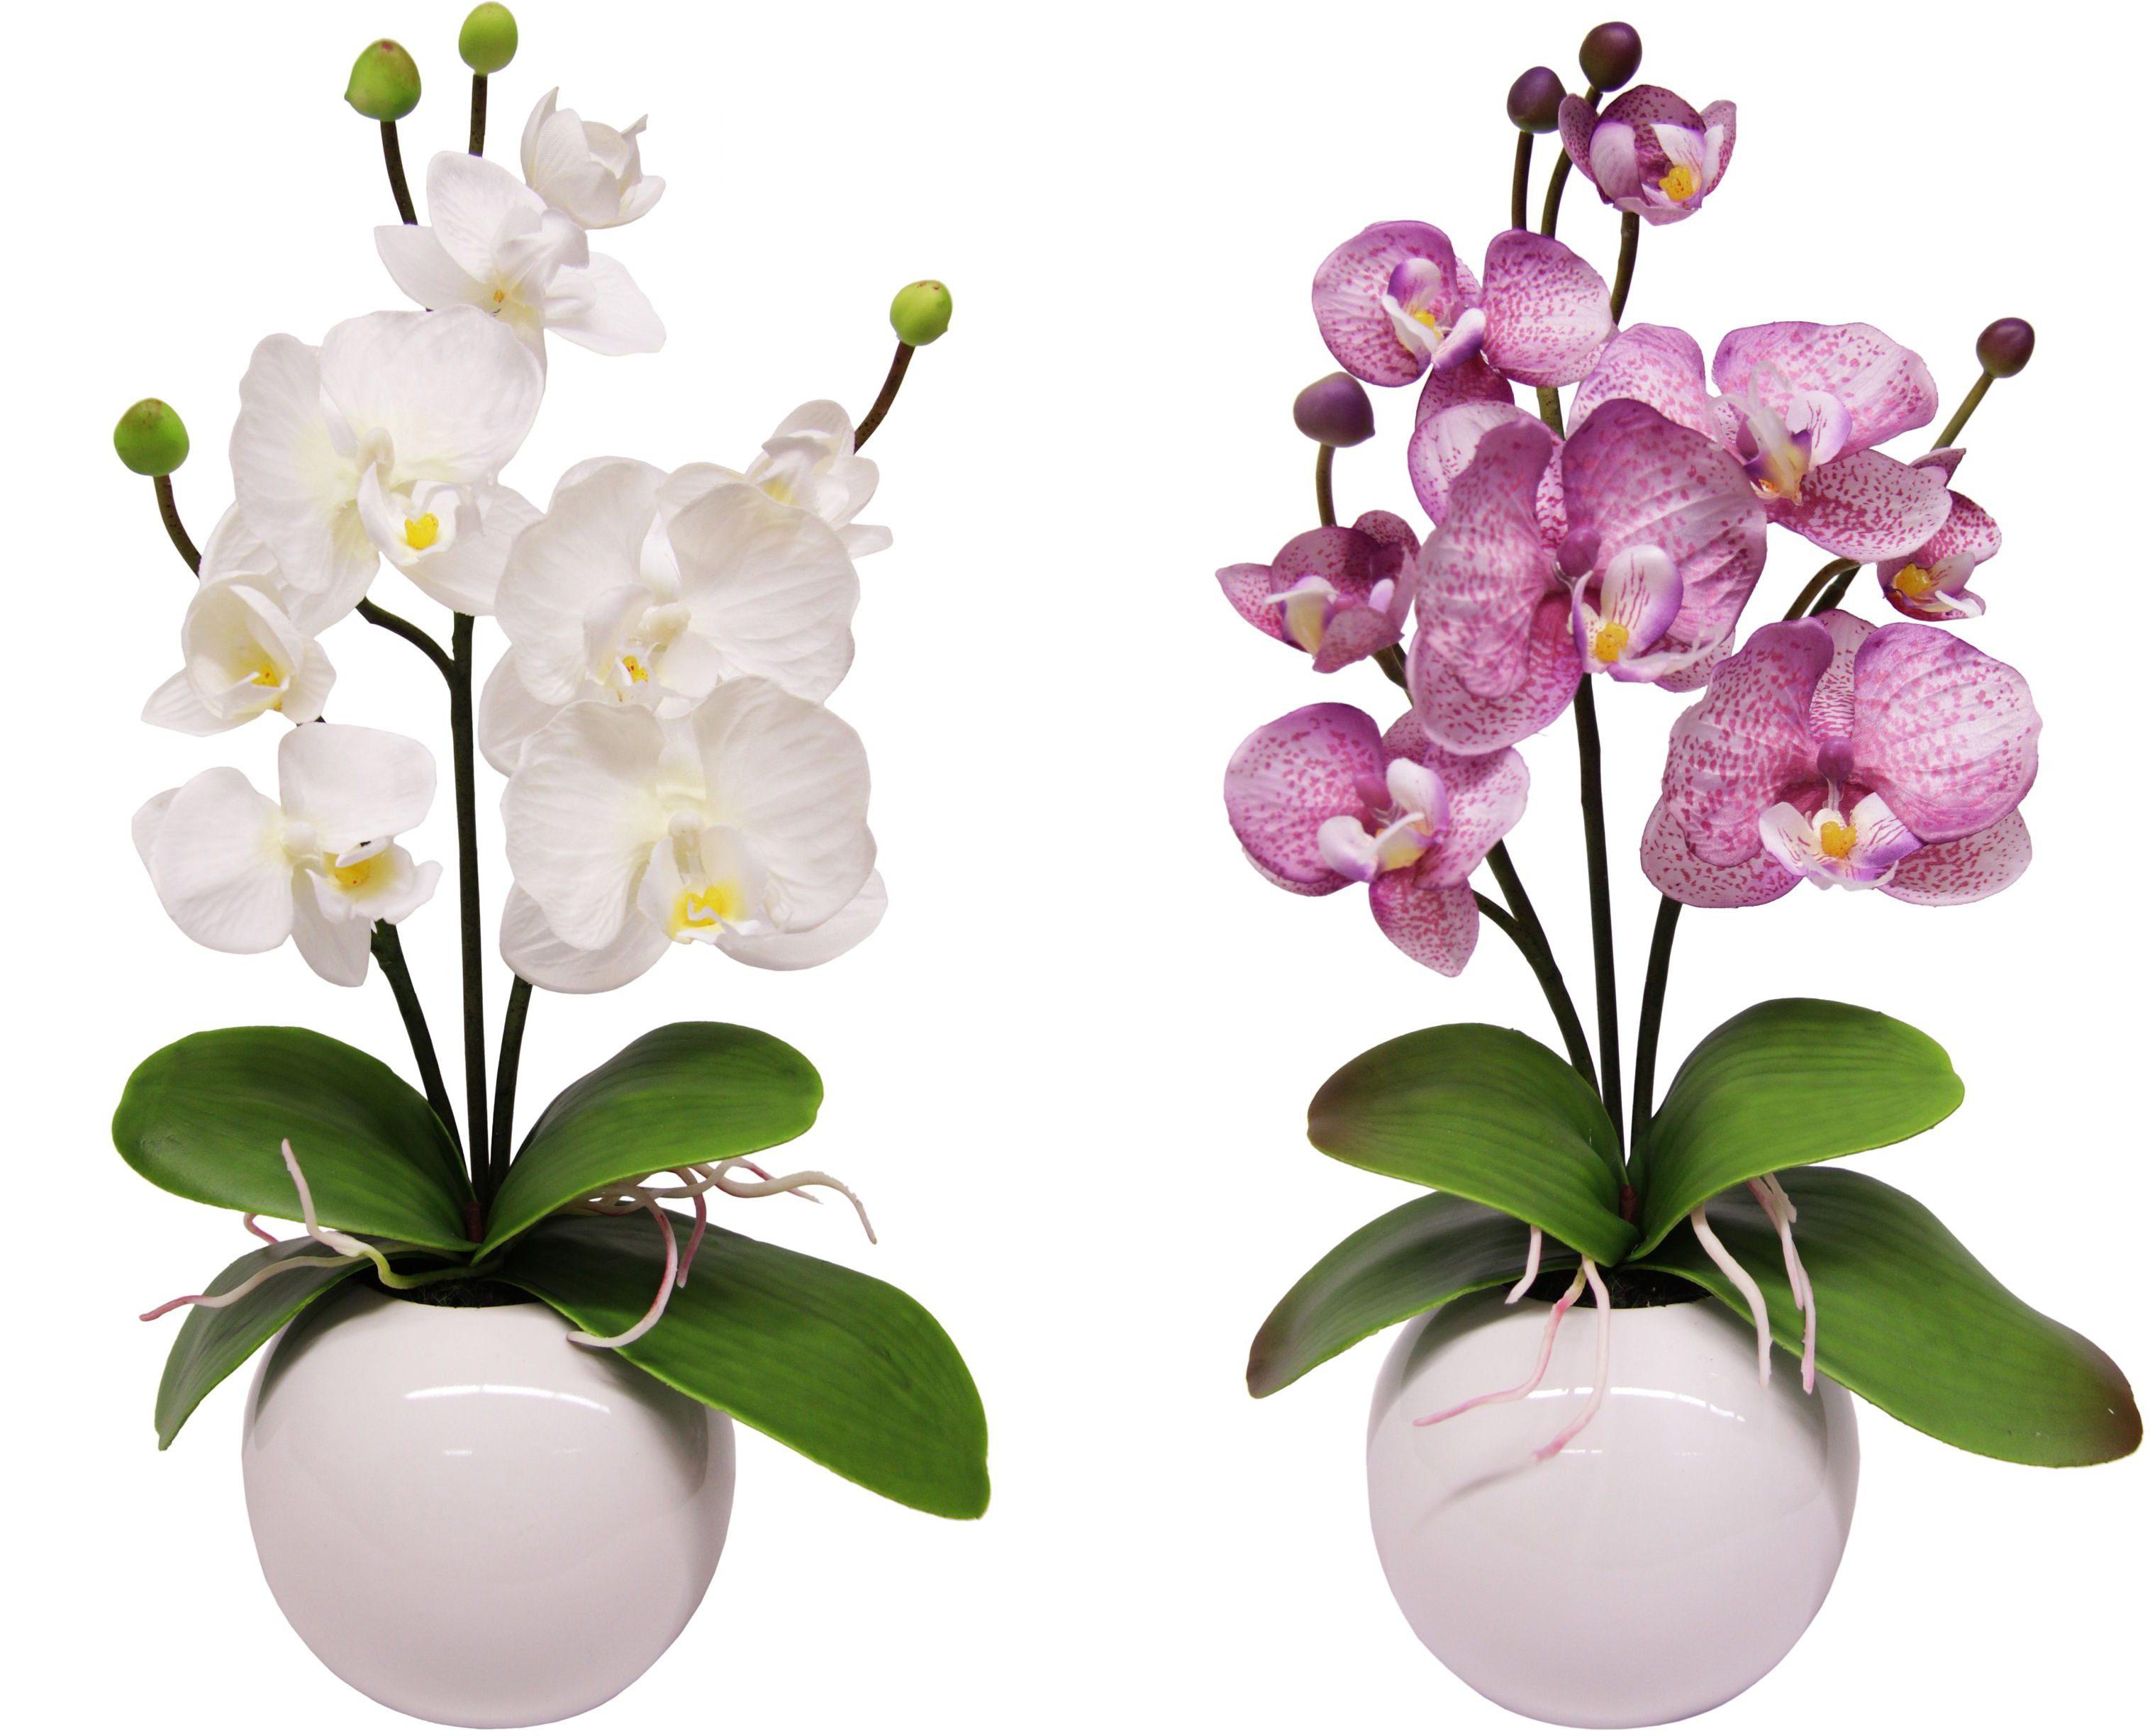 Home affaire Kunstblume »Orchidee« (2 Stck.)